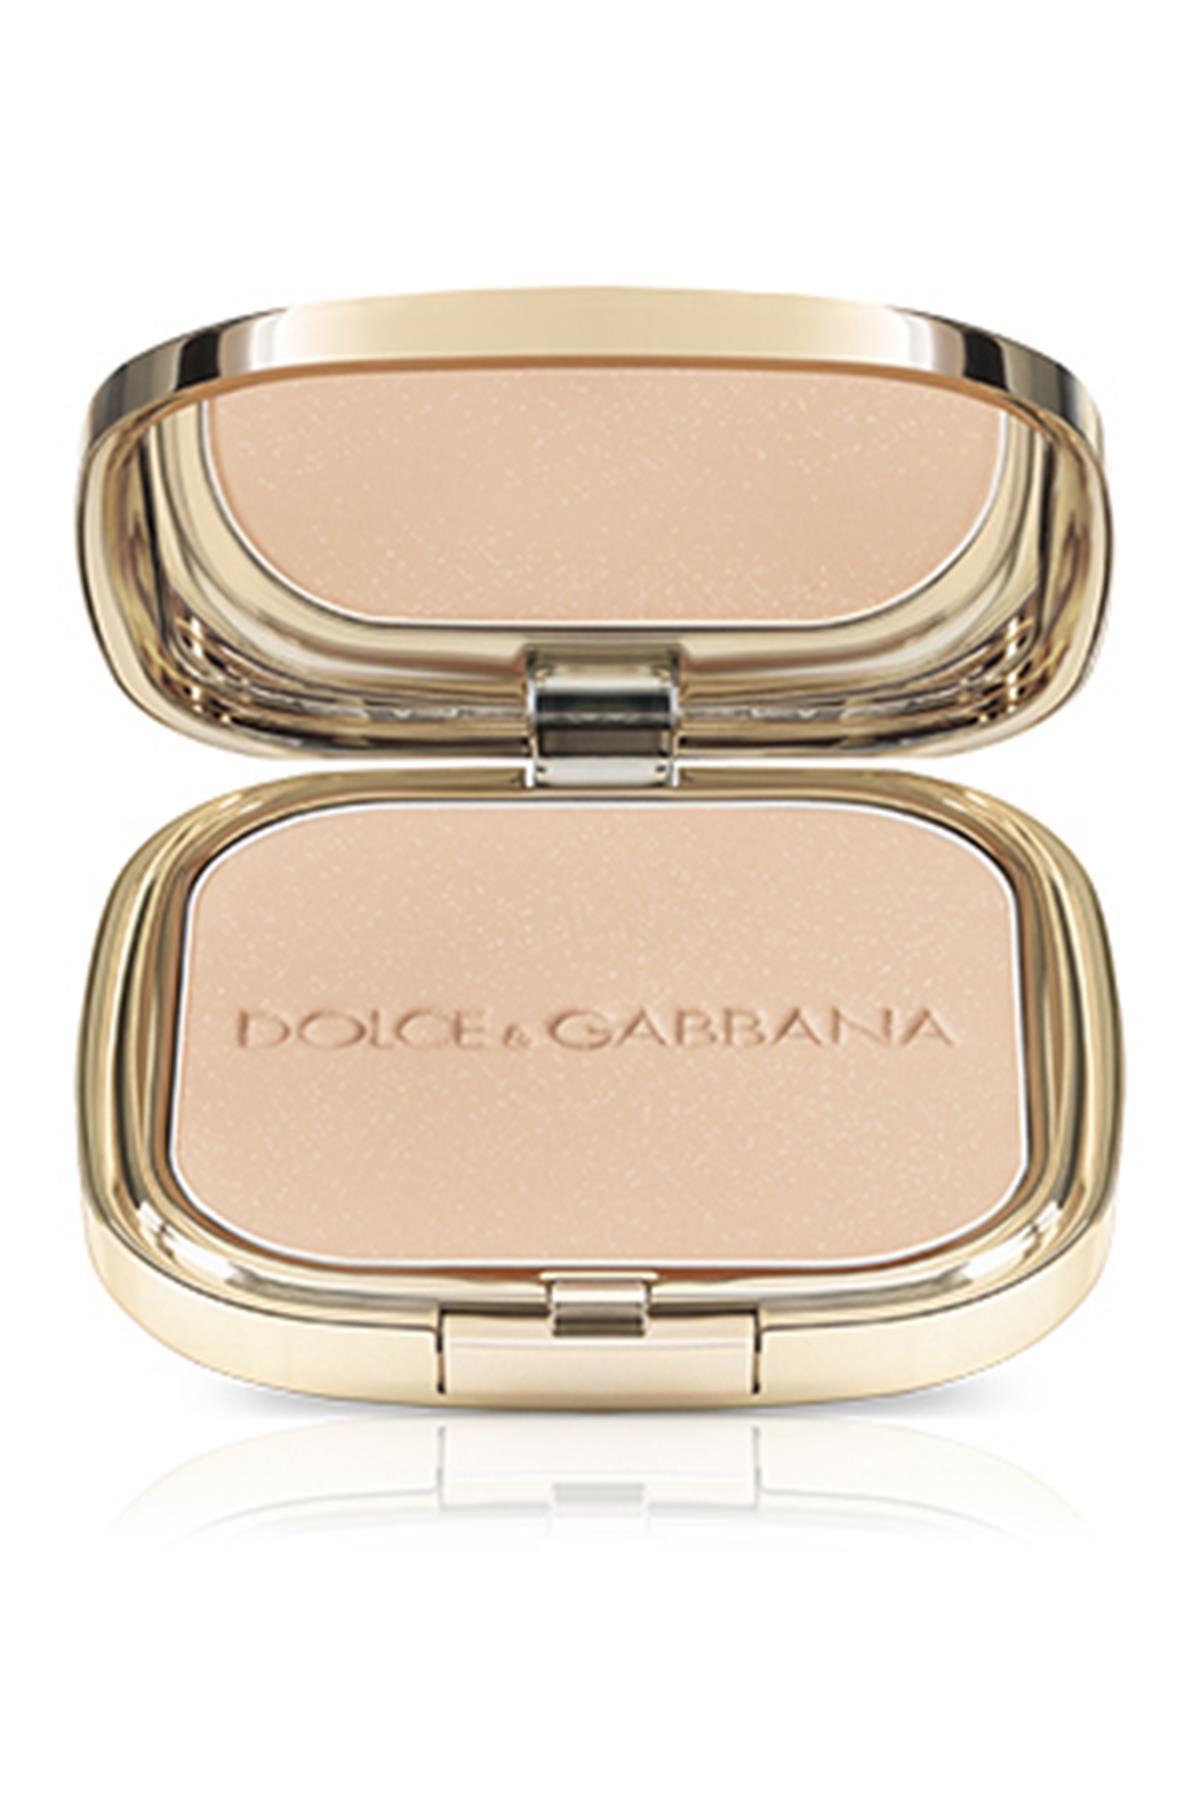 Dolce Gabbana Glow Illuminating Powder 4 Luna Aydınlatıcı Pudra